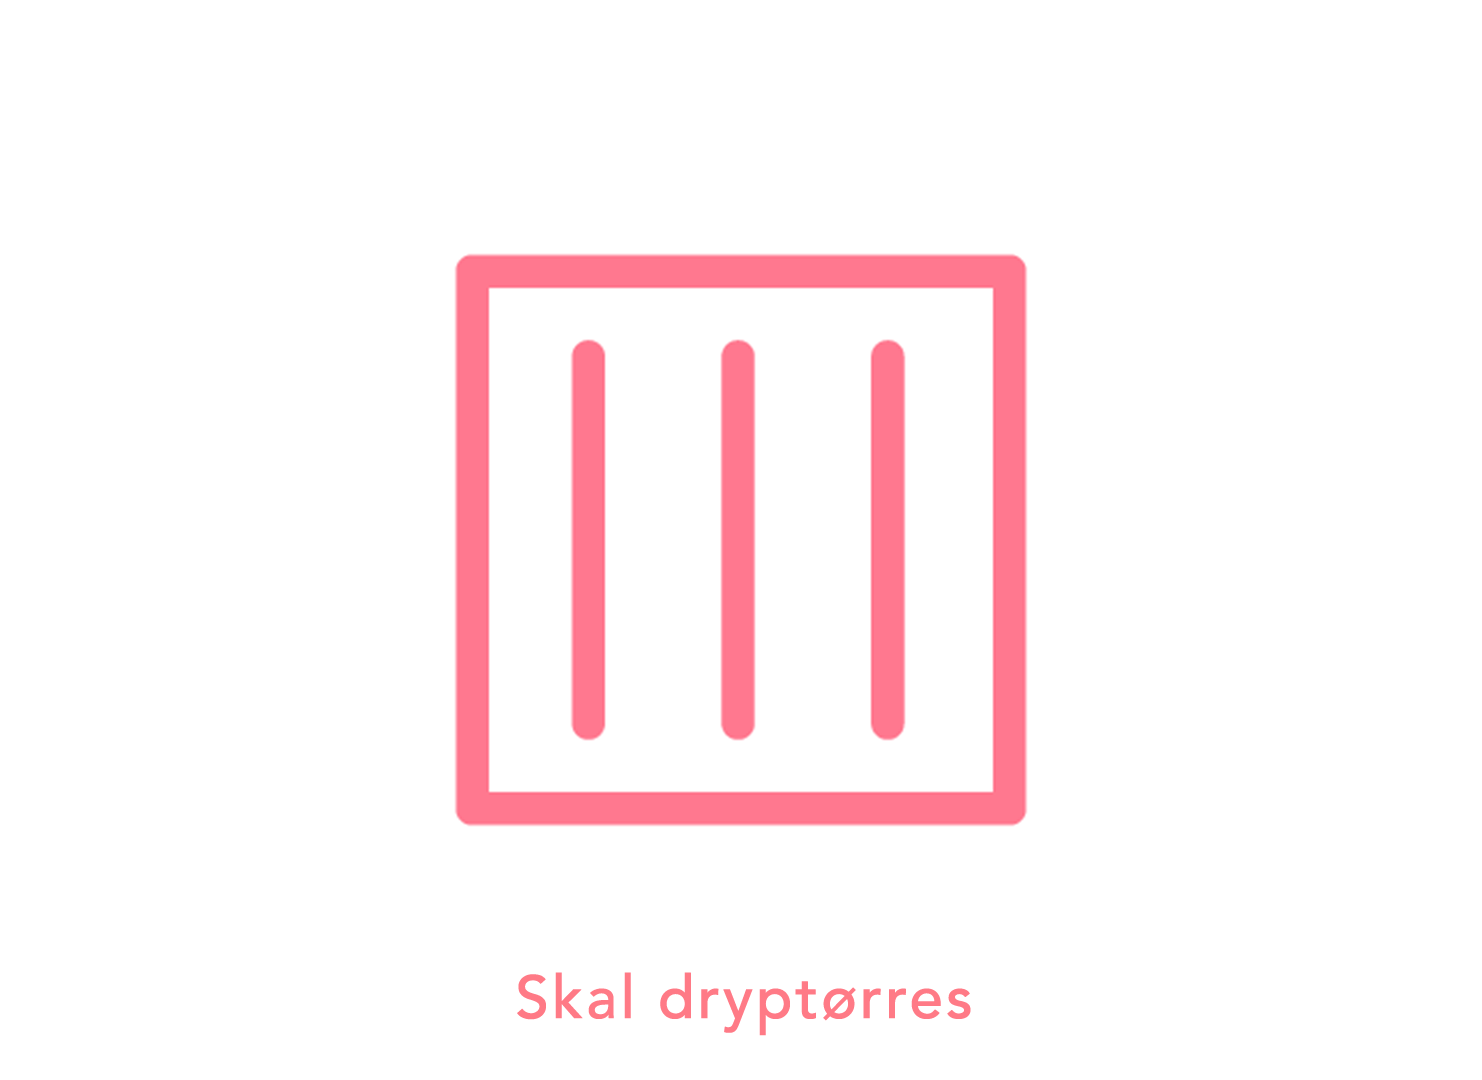 Dryptorres.png